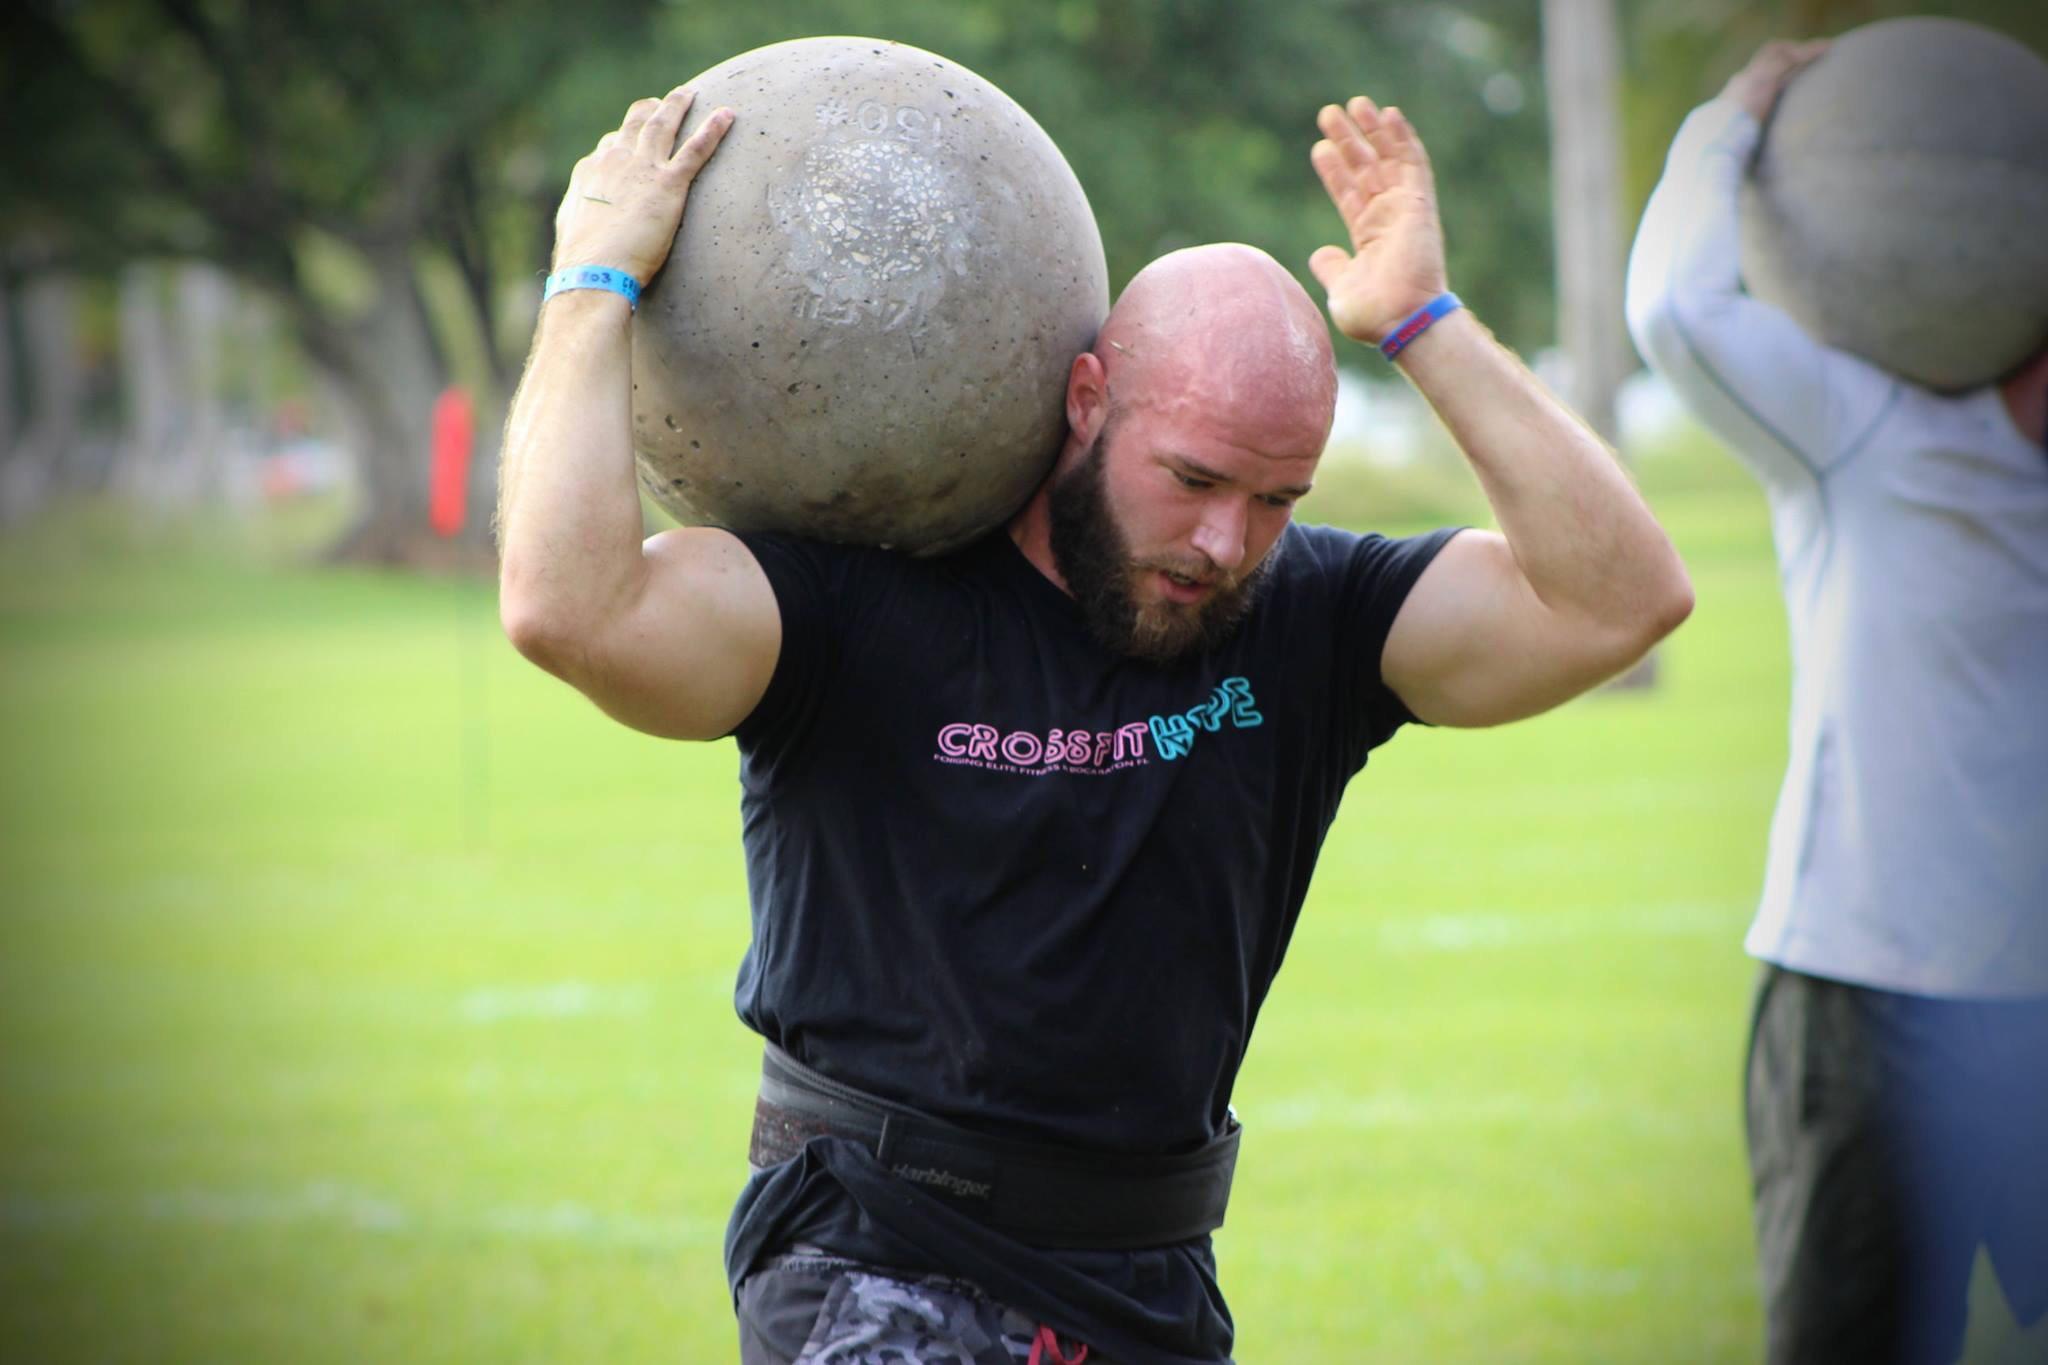 Coach David Stevens - CrossFit HYPE - Crush Games Pro division